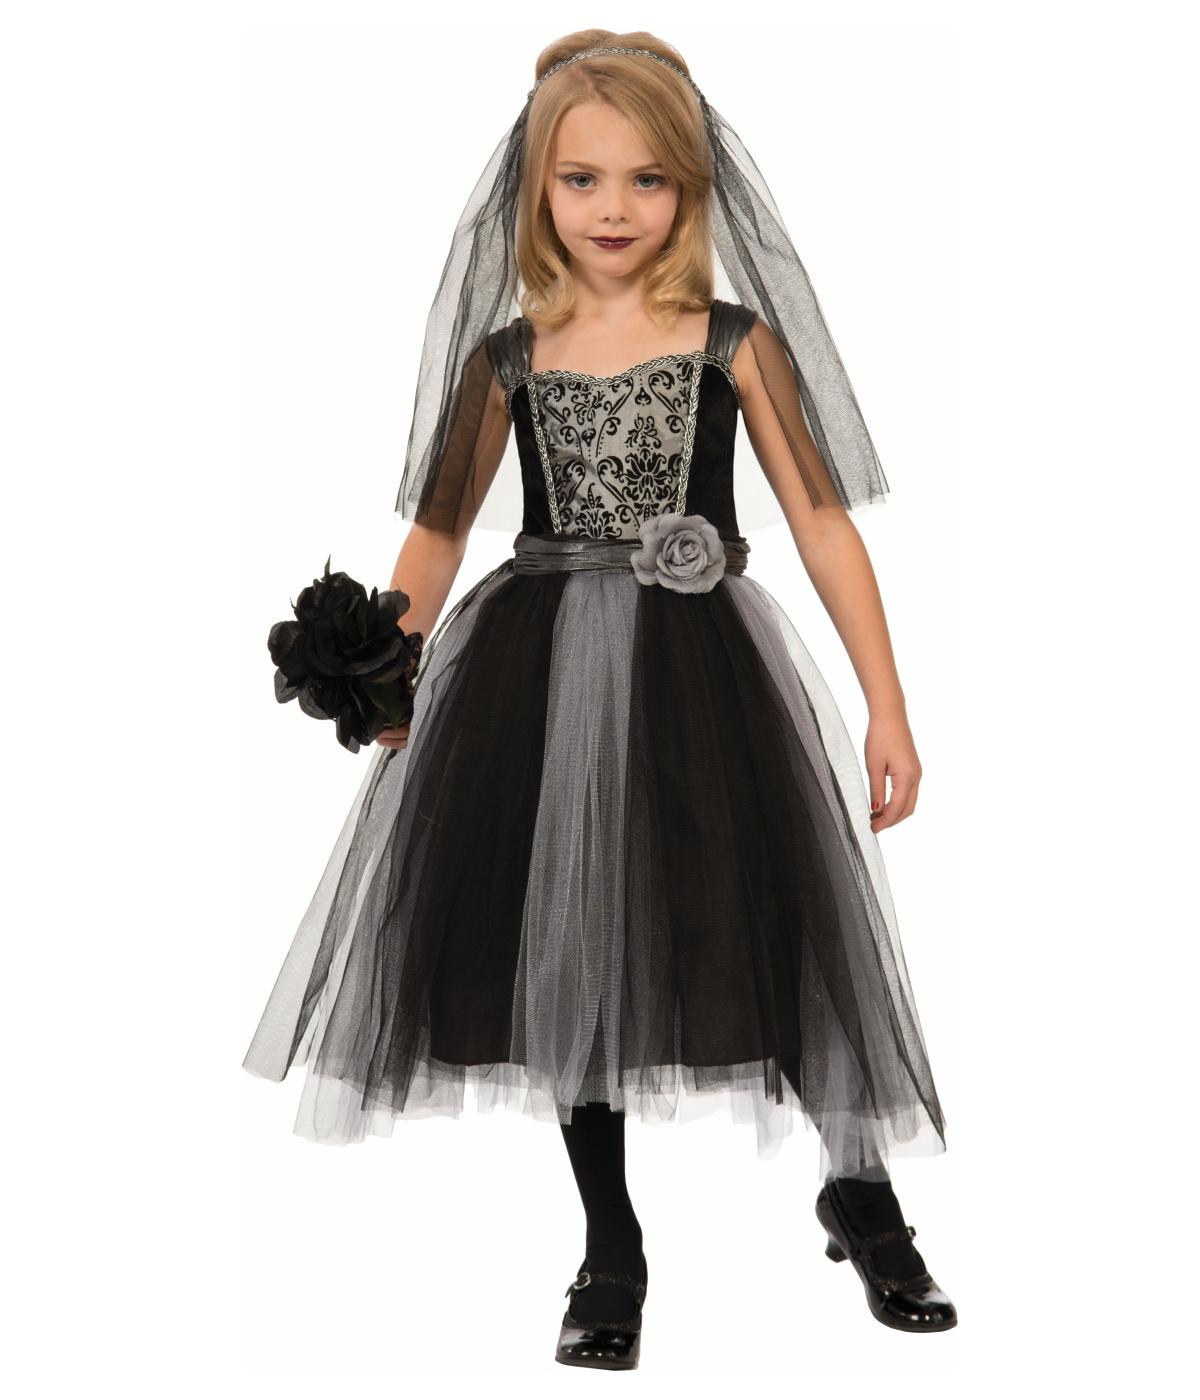 Black girl halloween costume ideas-6213